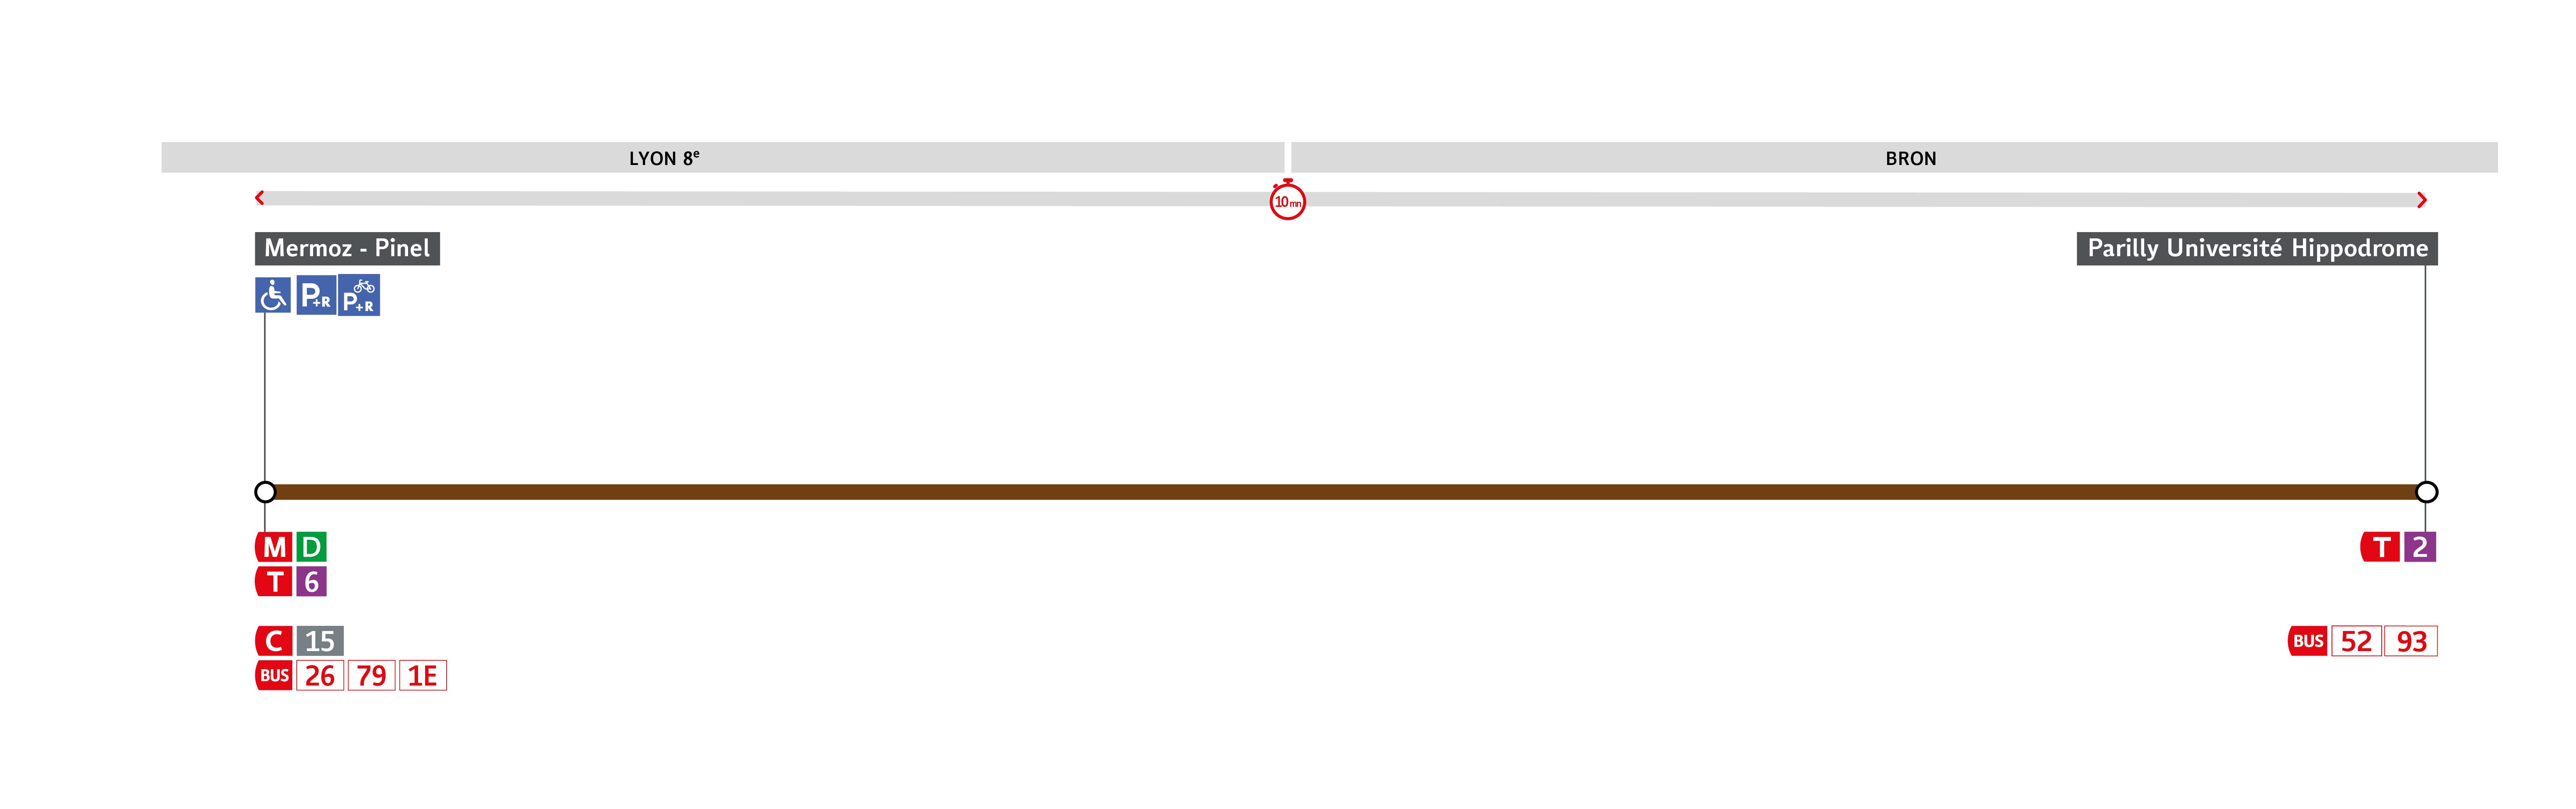 Thermomètre de la ligne C15E